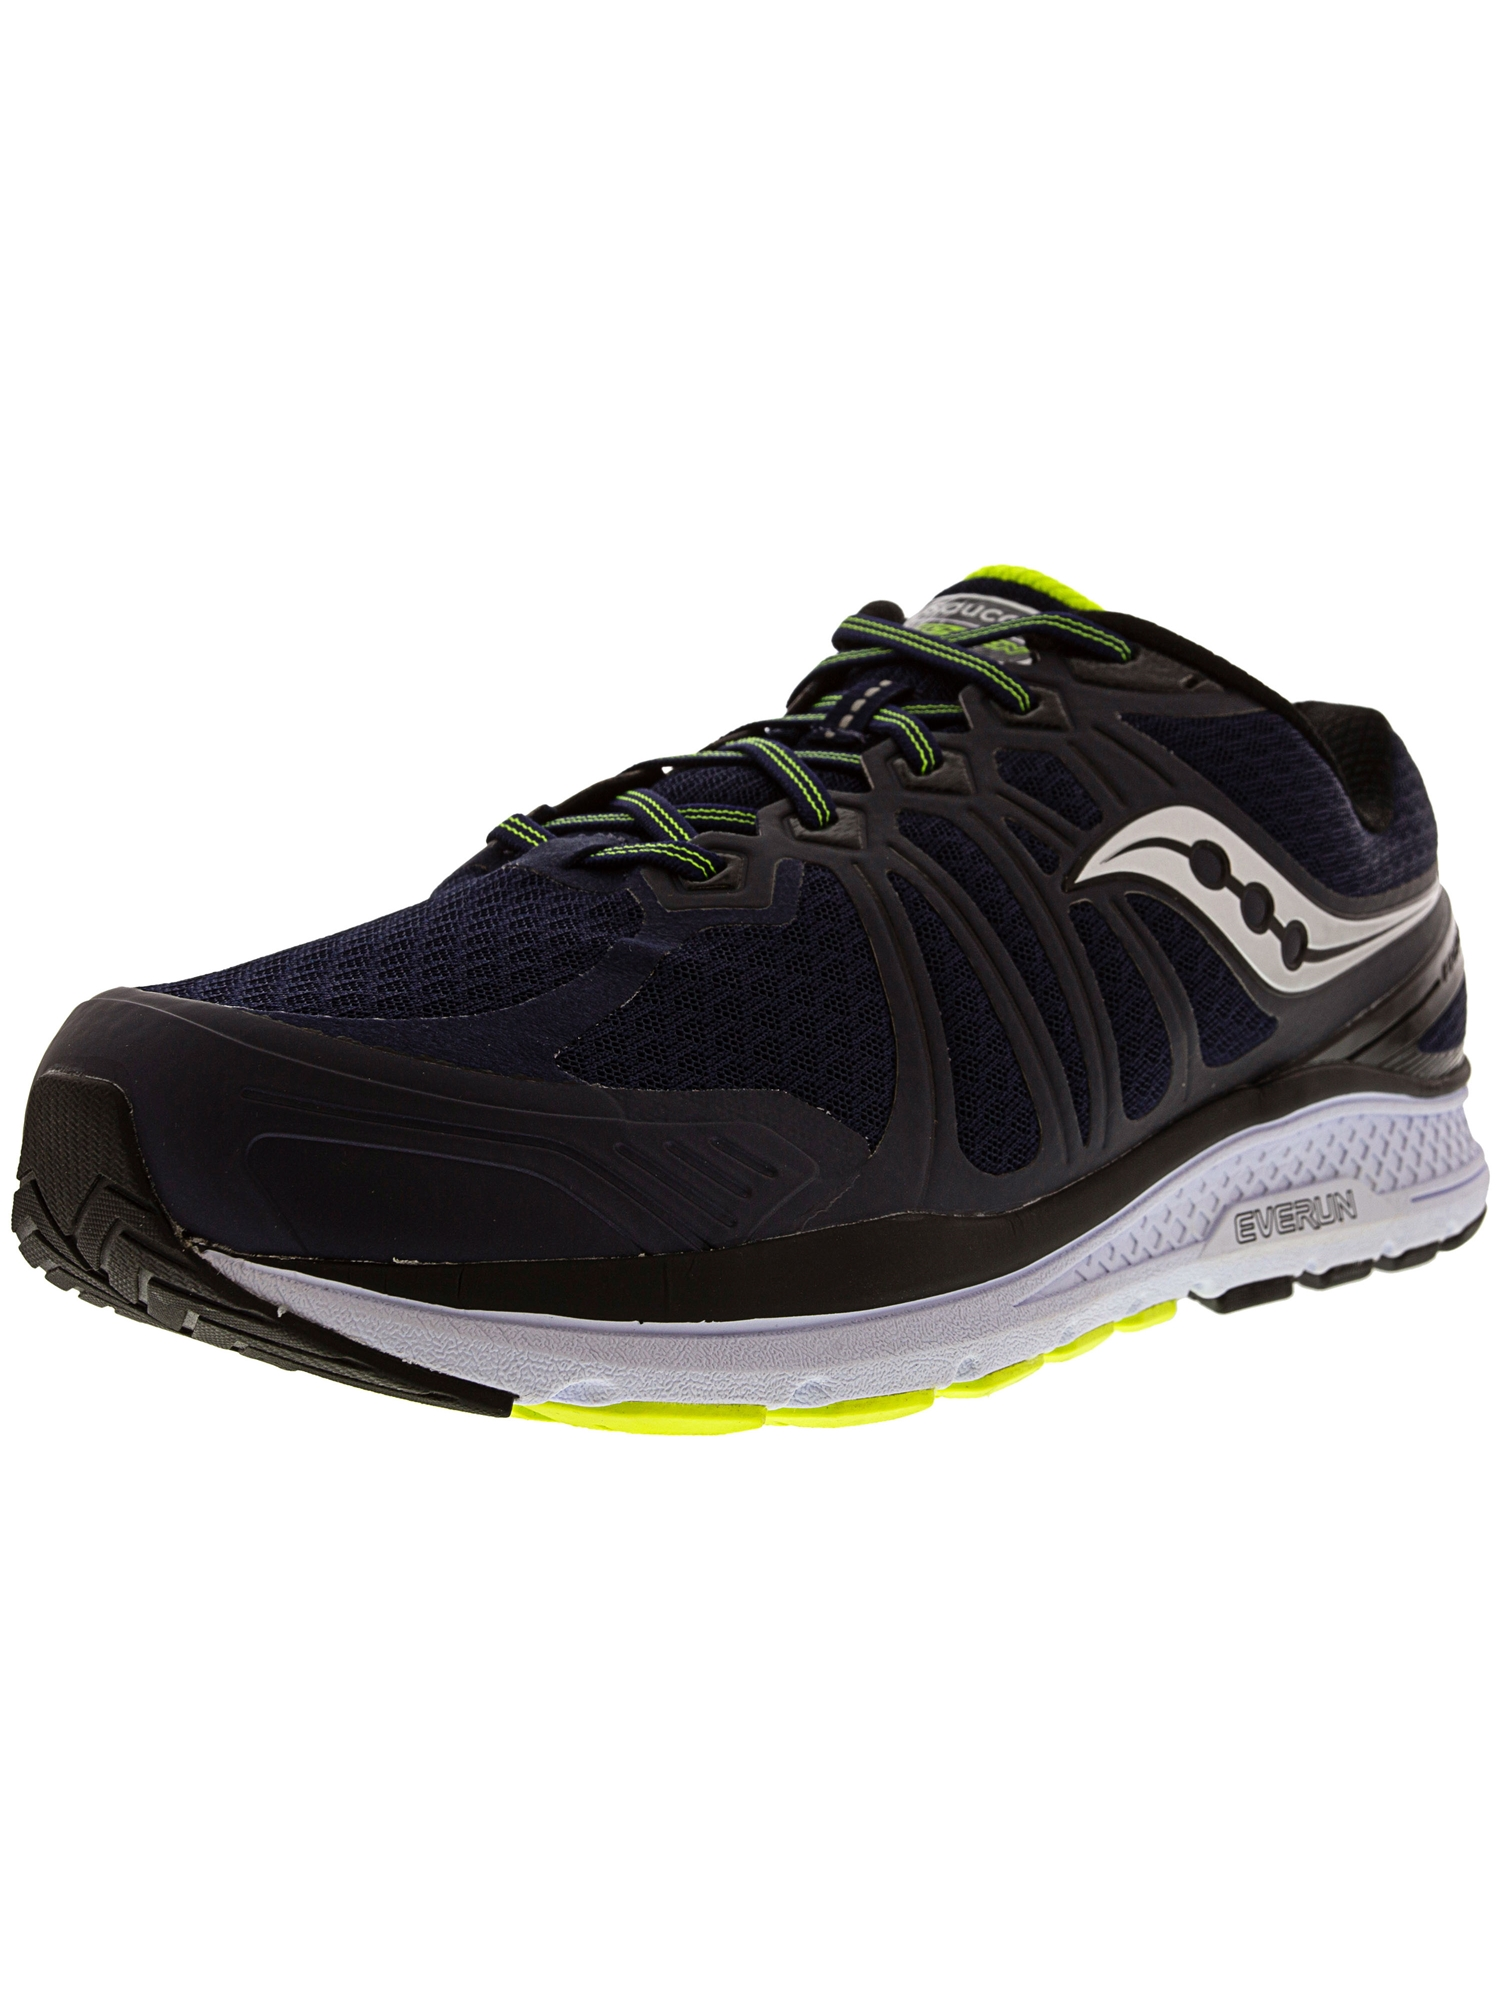 66c9106d1c Saucony Men's Echelon 6 Navy / Citron Ankle-High Running Shoe - 9WW